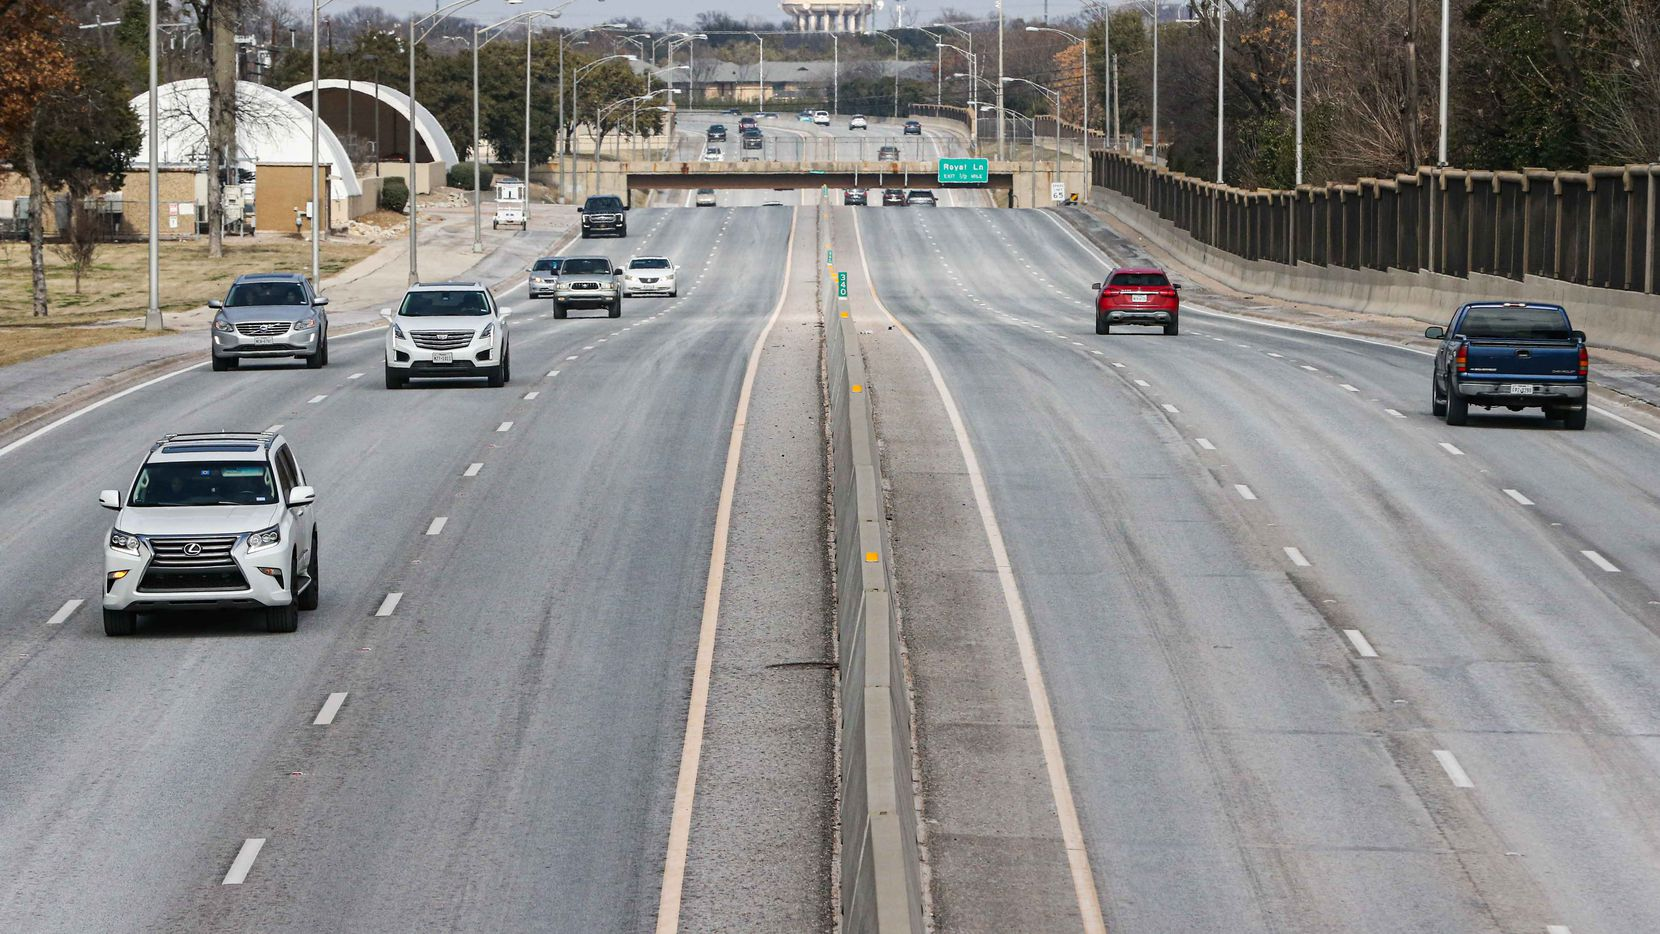 Traffic on Dallas North Tollway under Walnut Hill Lane in Dallas on Saturday, February 13, 2021. (Lola Gomez / The Dallas Morning News)